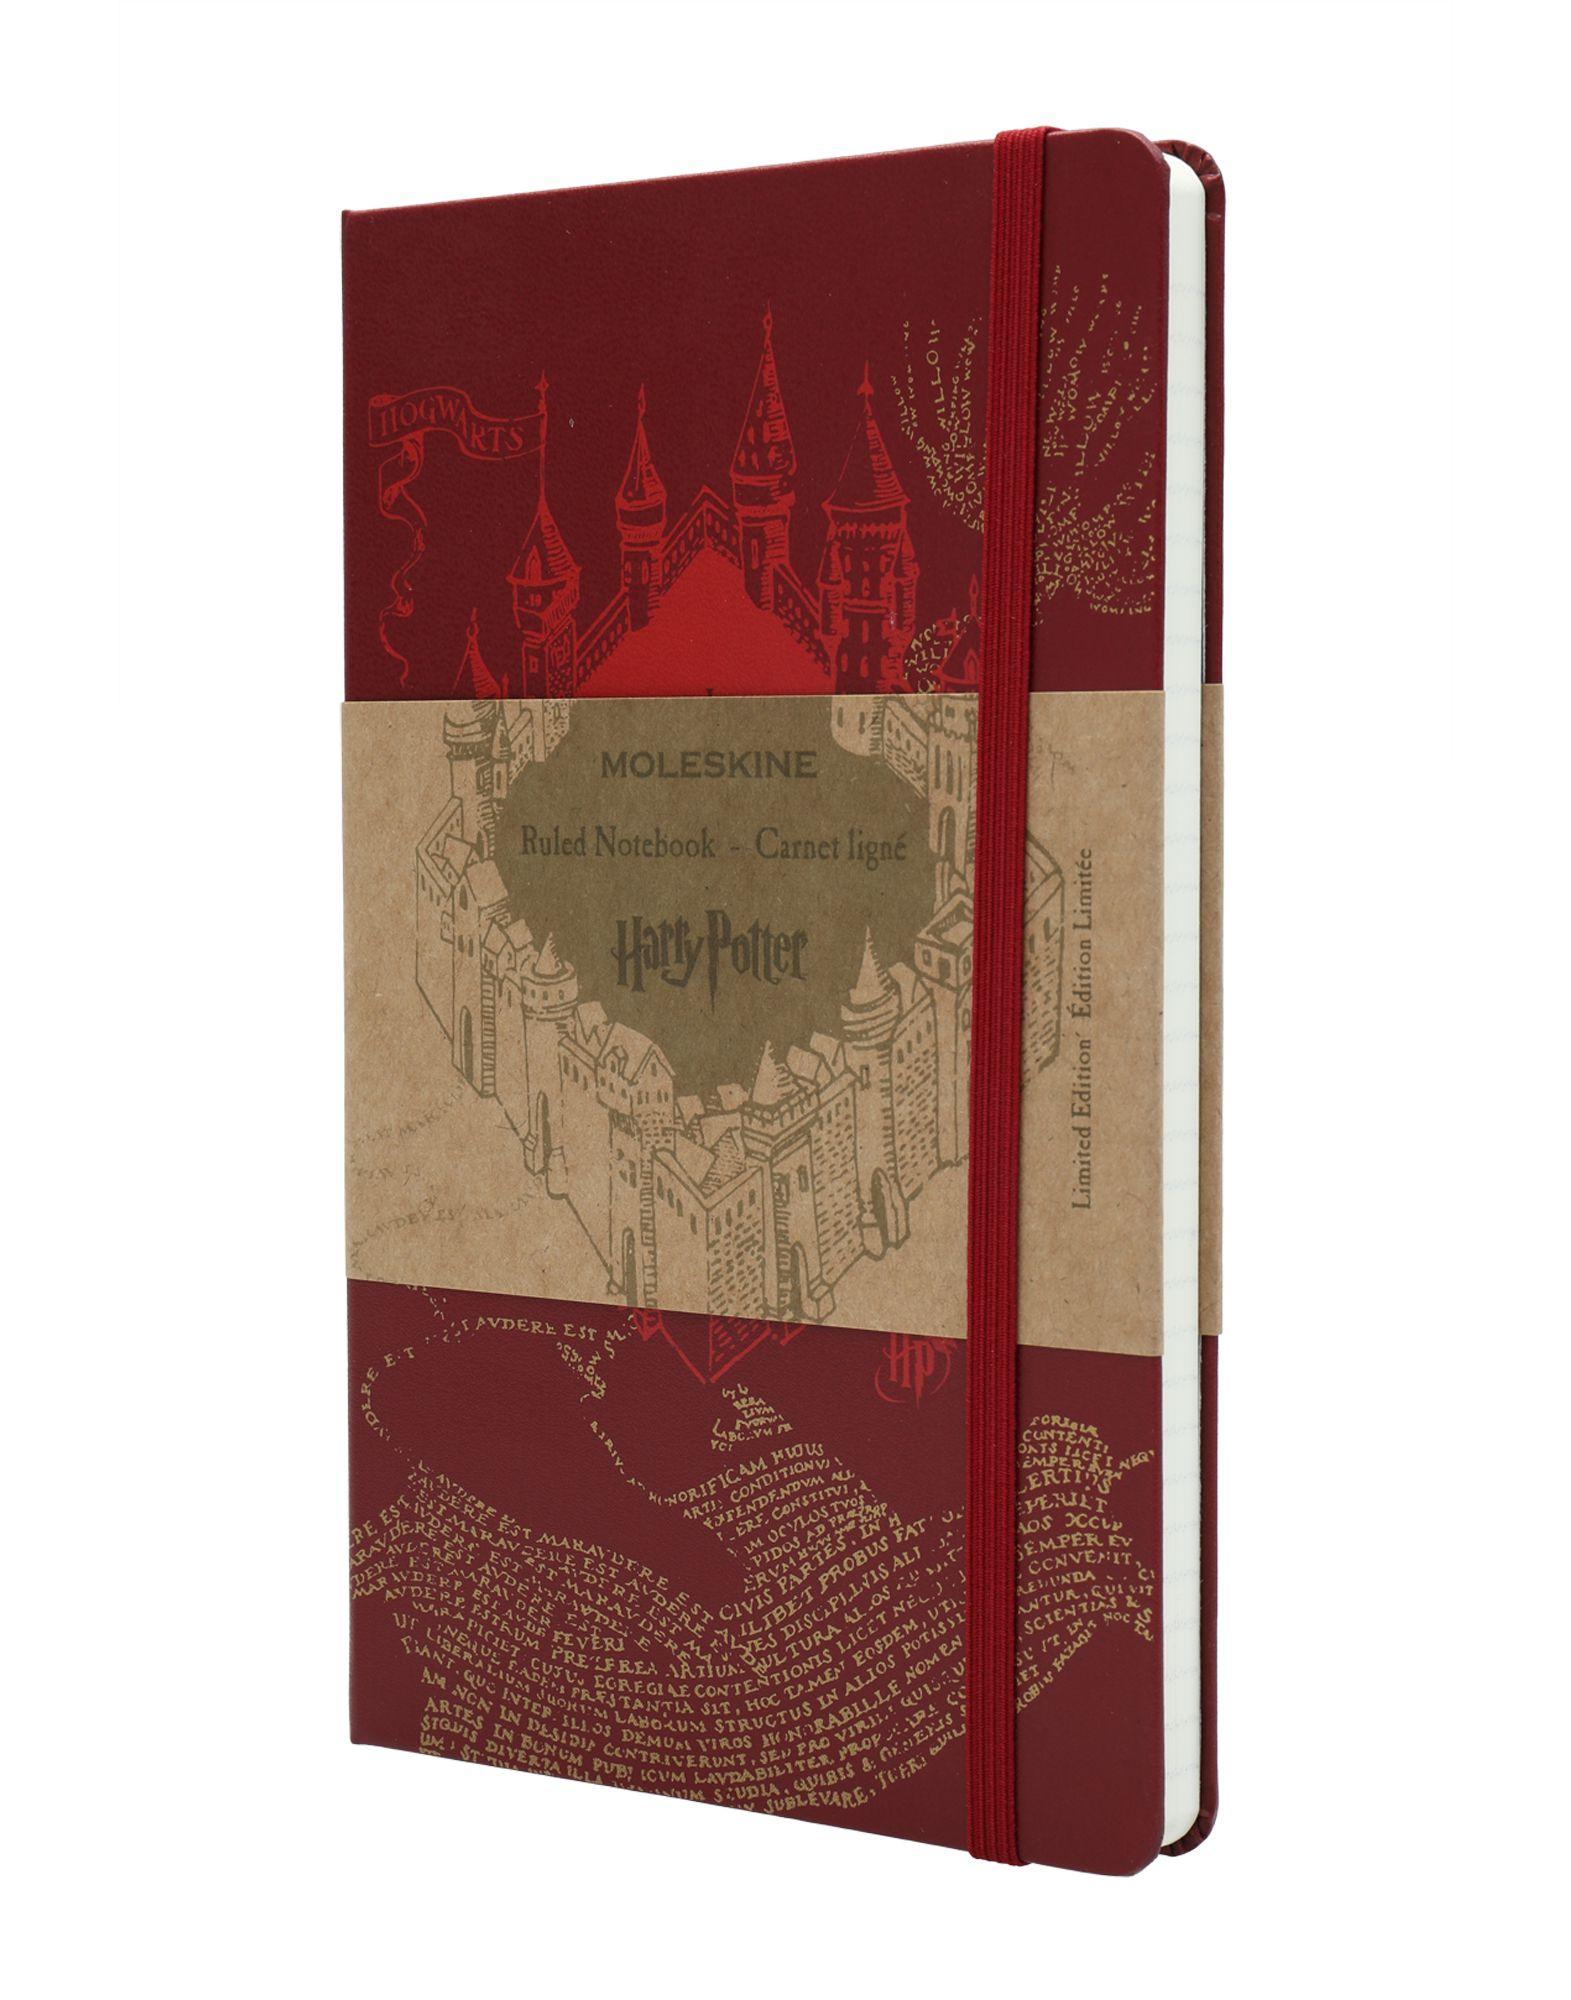 MOLESKINE Записная книжка giudi записная книжка